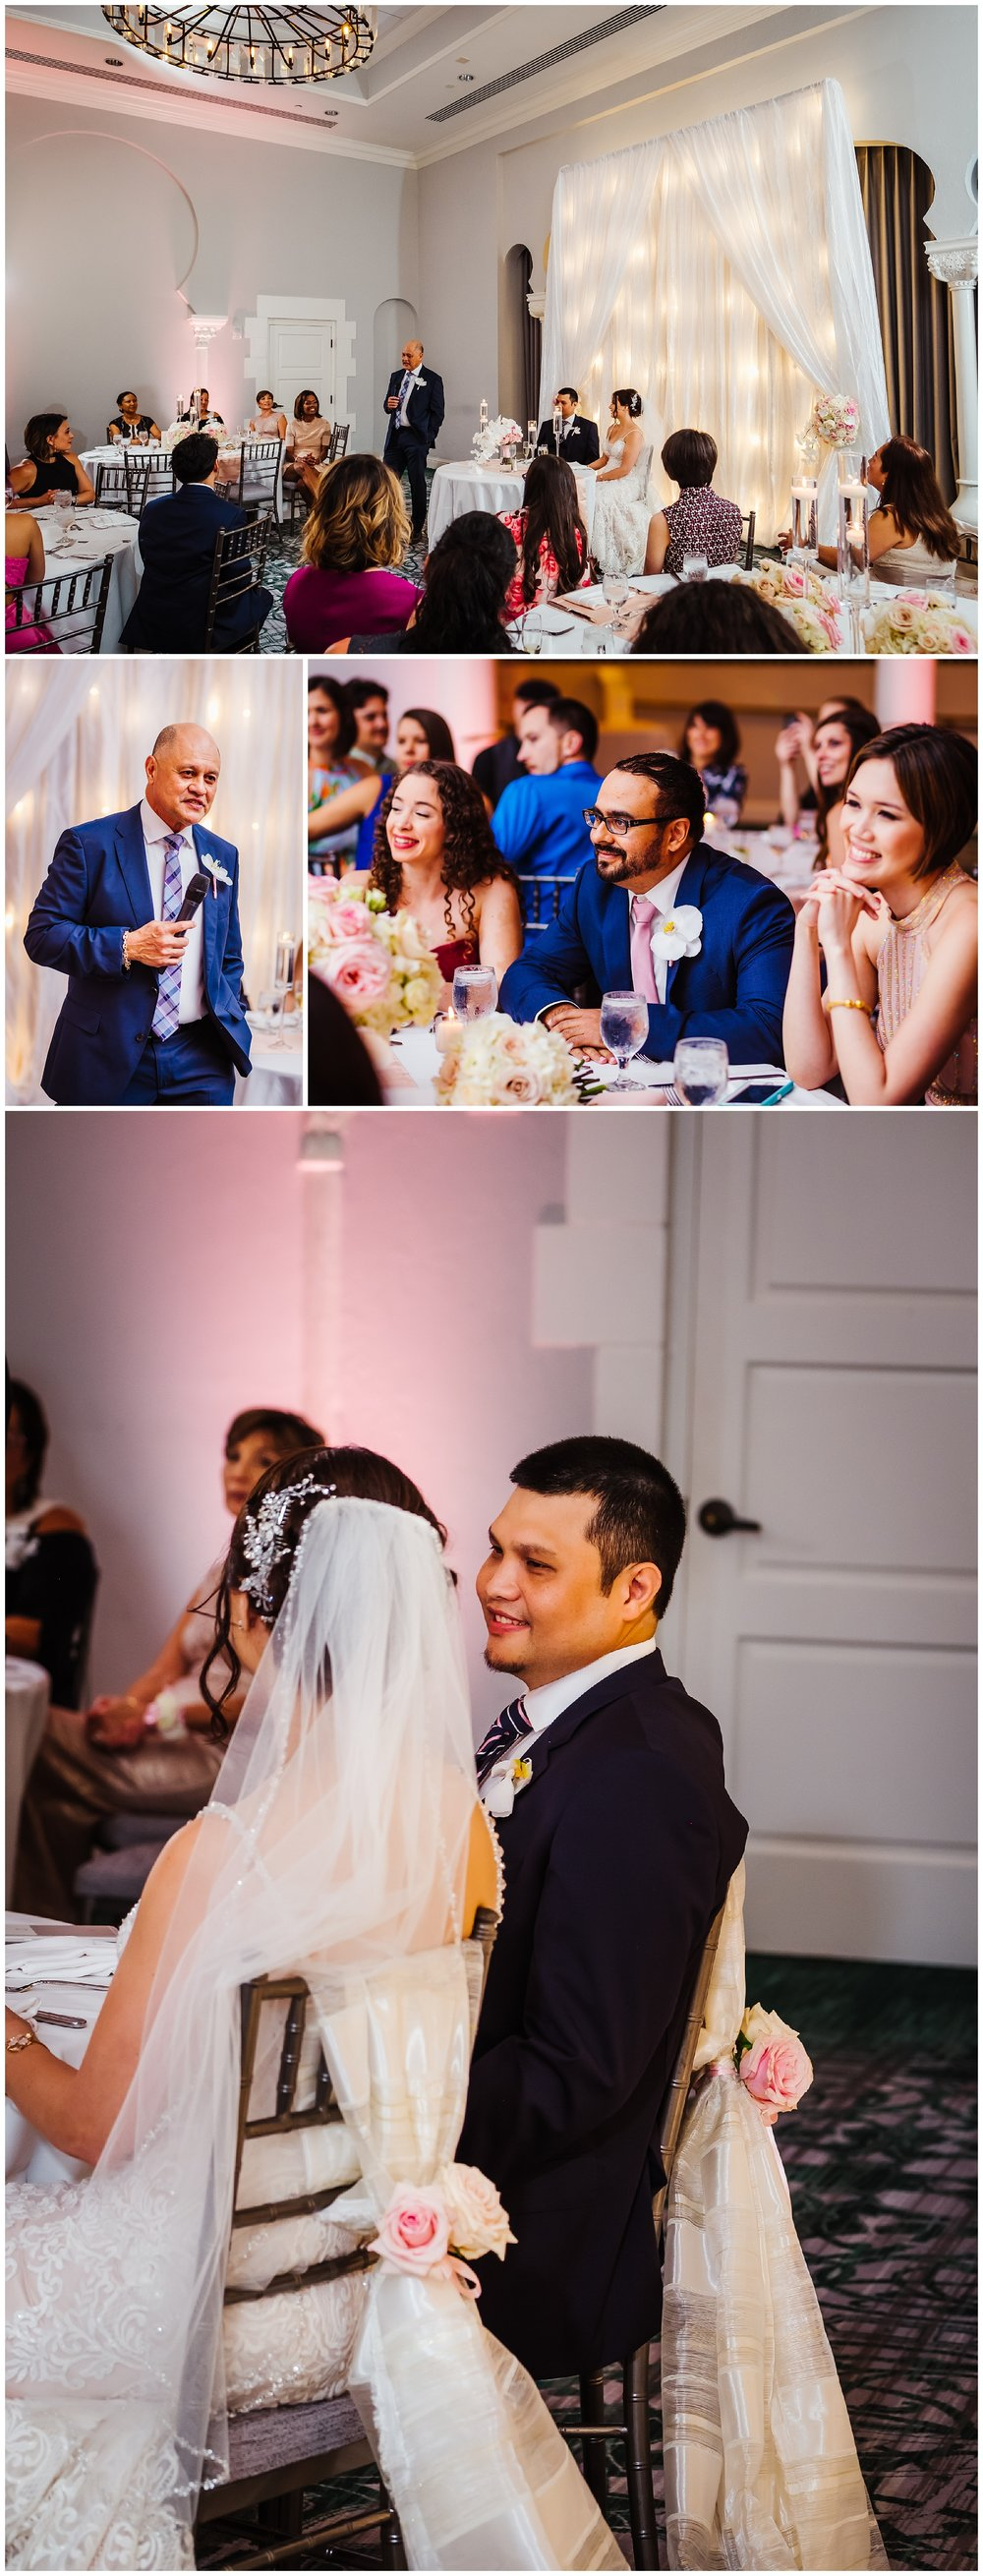 vinoy-sunset-ballroom-rainy-day-wedding-photography-orchids-trinidad-flawless-fetes-ashlee-hamon_0149.jpg